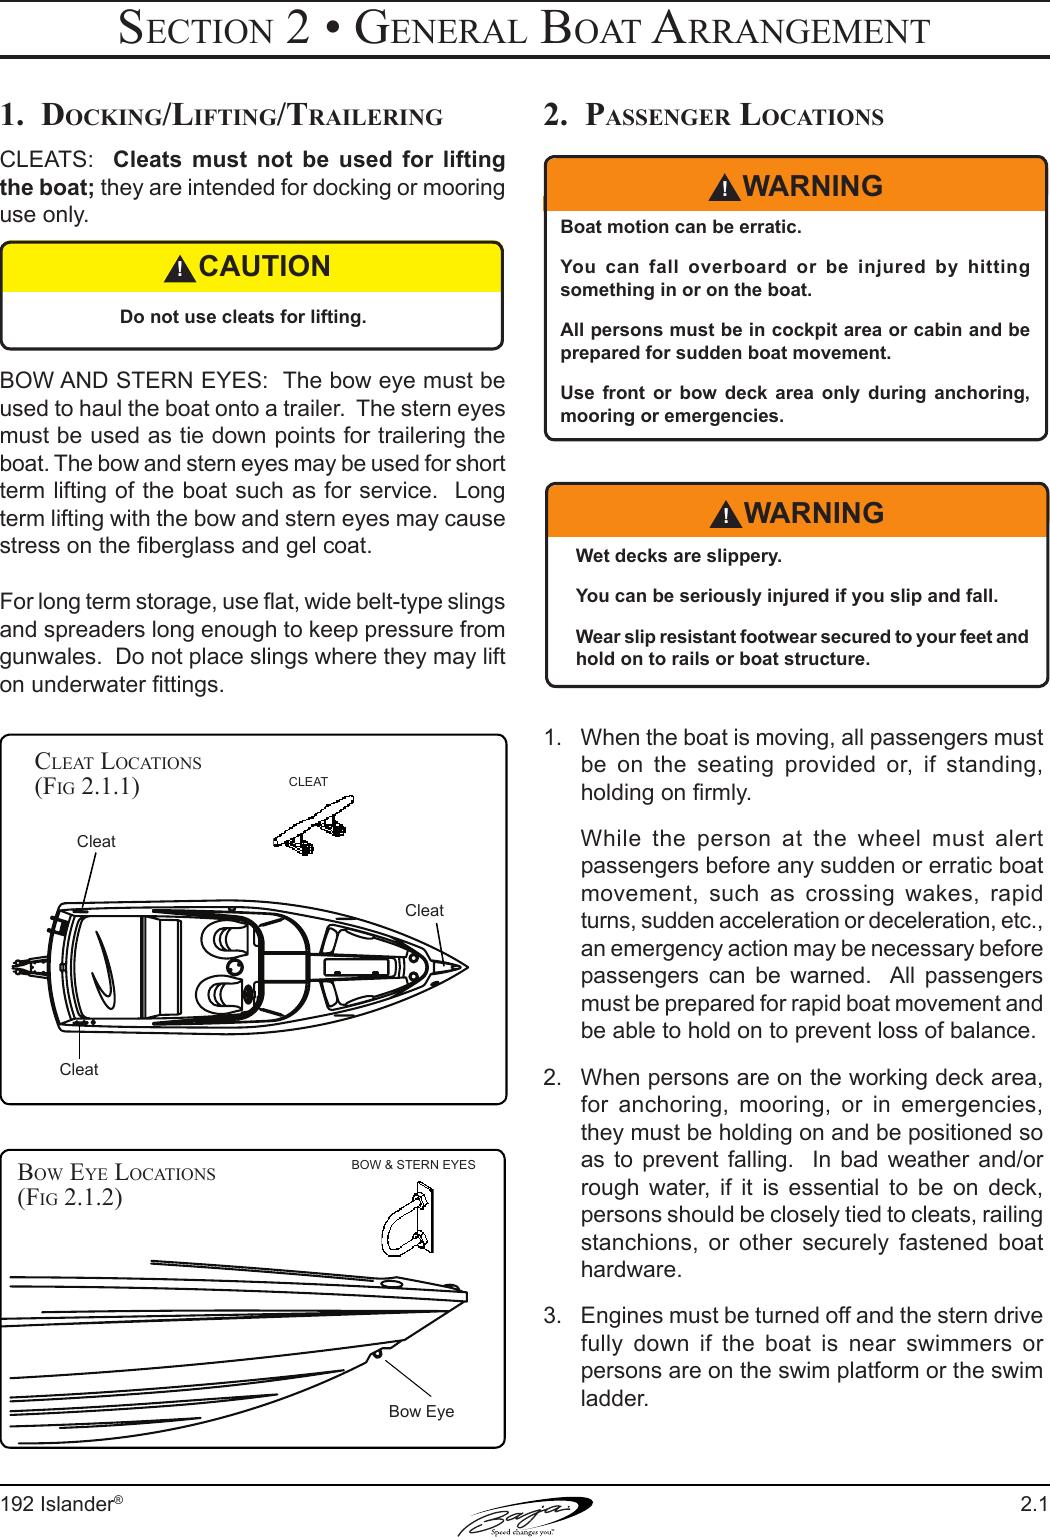 Baja Marine 192 Islander Users Manual